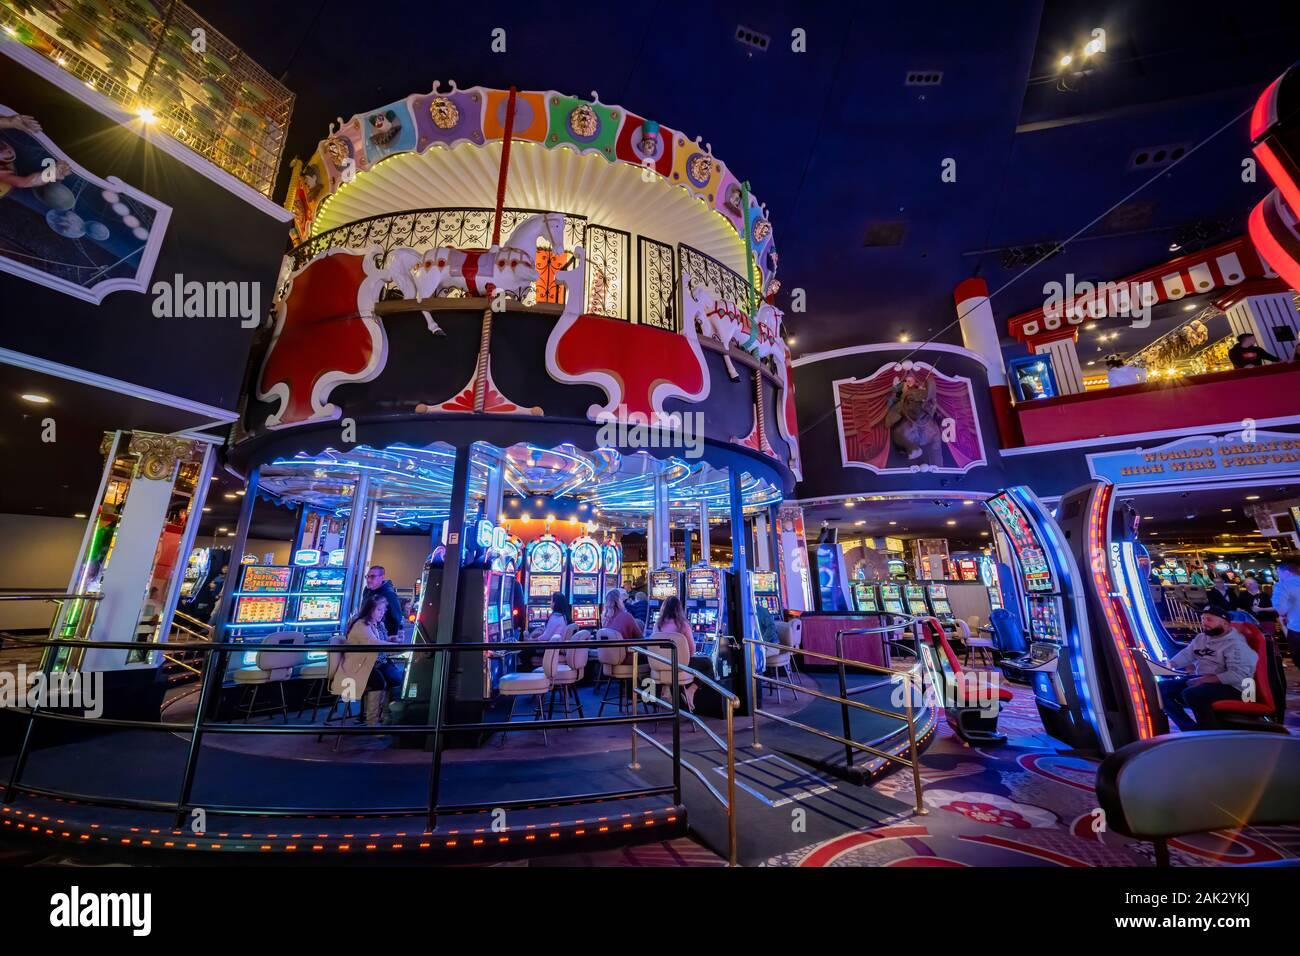 Las Vegas Jan 4 Interior View Of The Famous Circus Circus Hotel